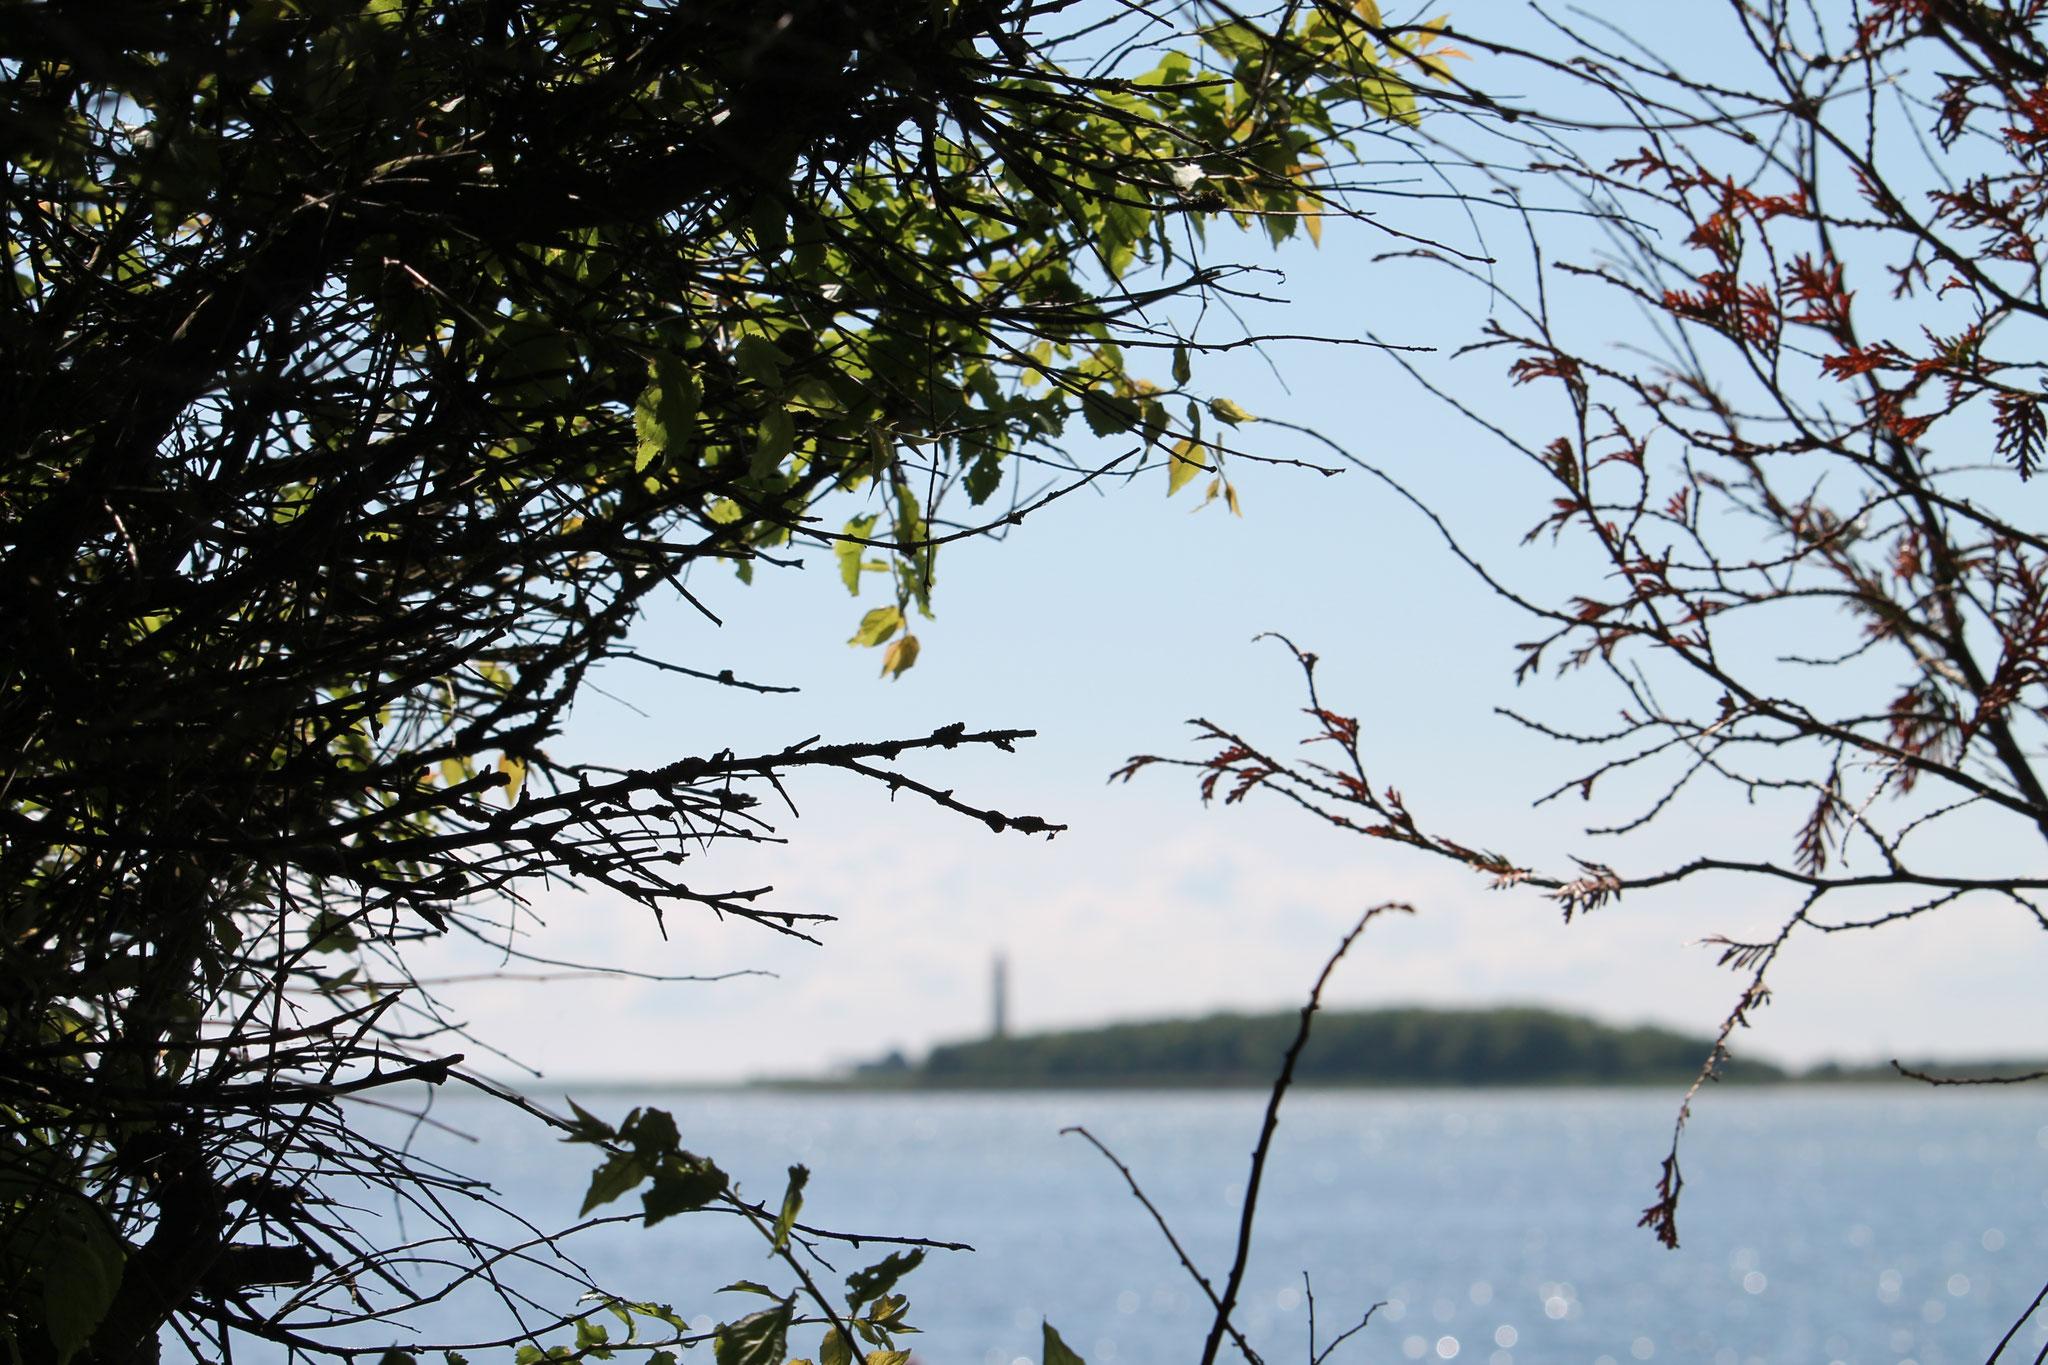 Meeresidylle, Hafen Orth auf Fehmarn